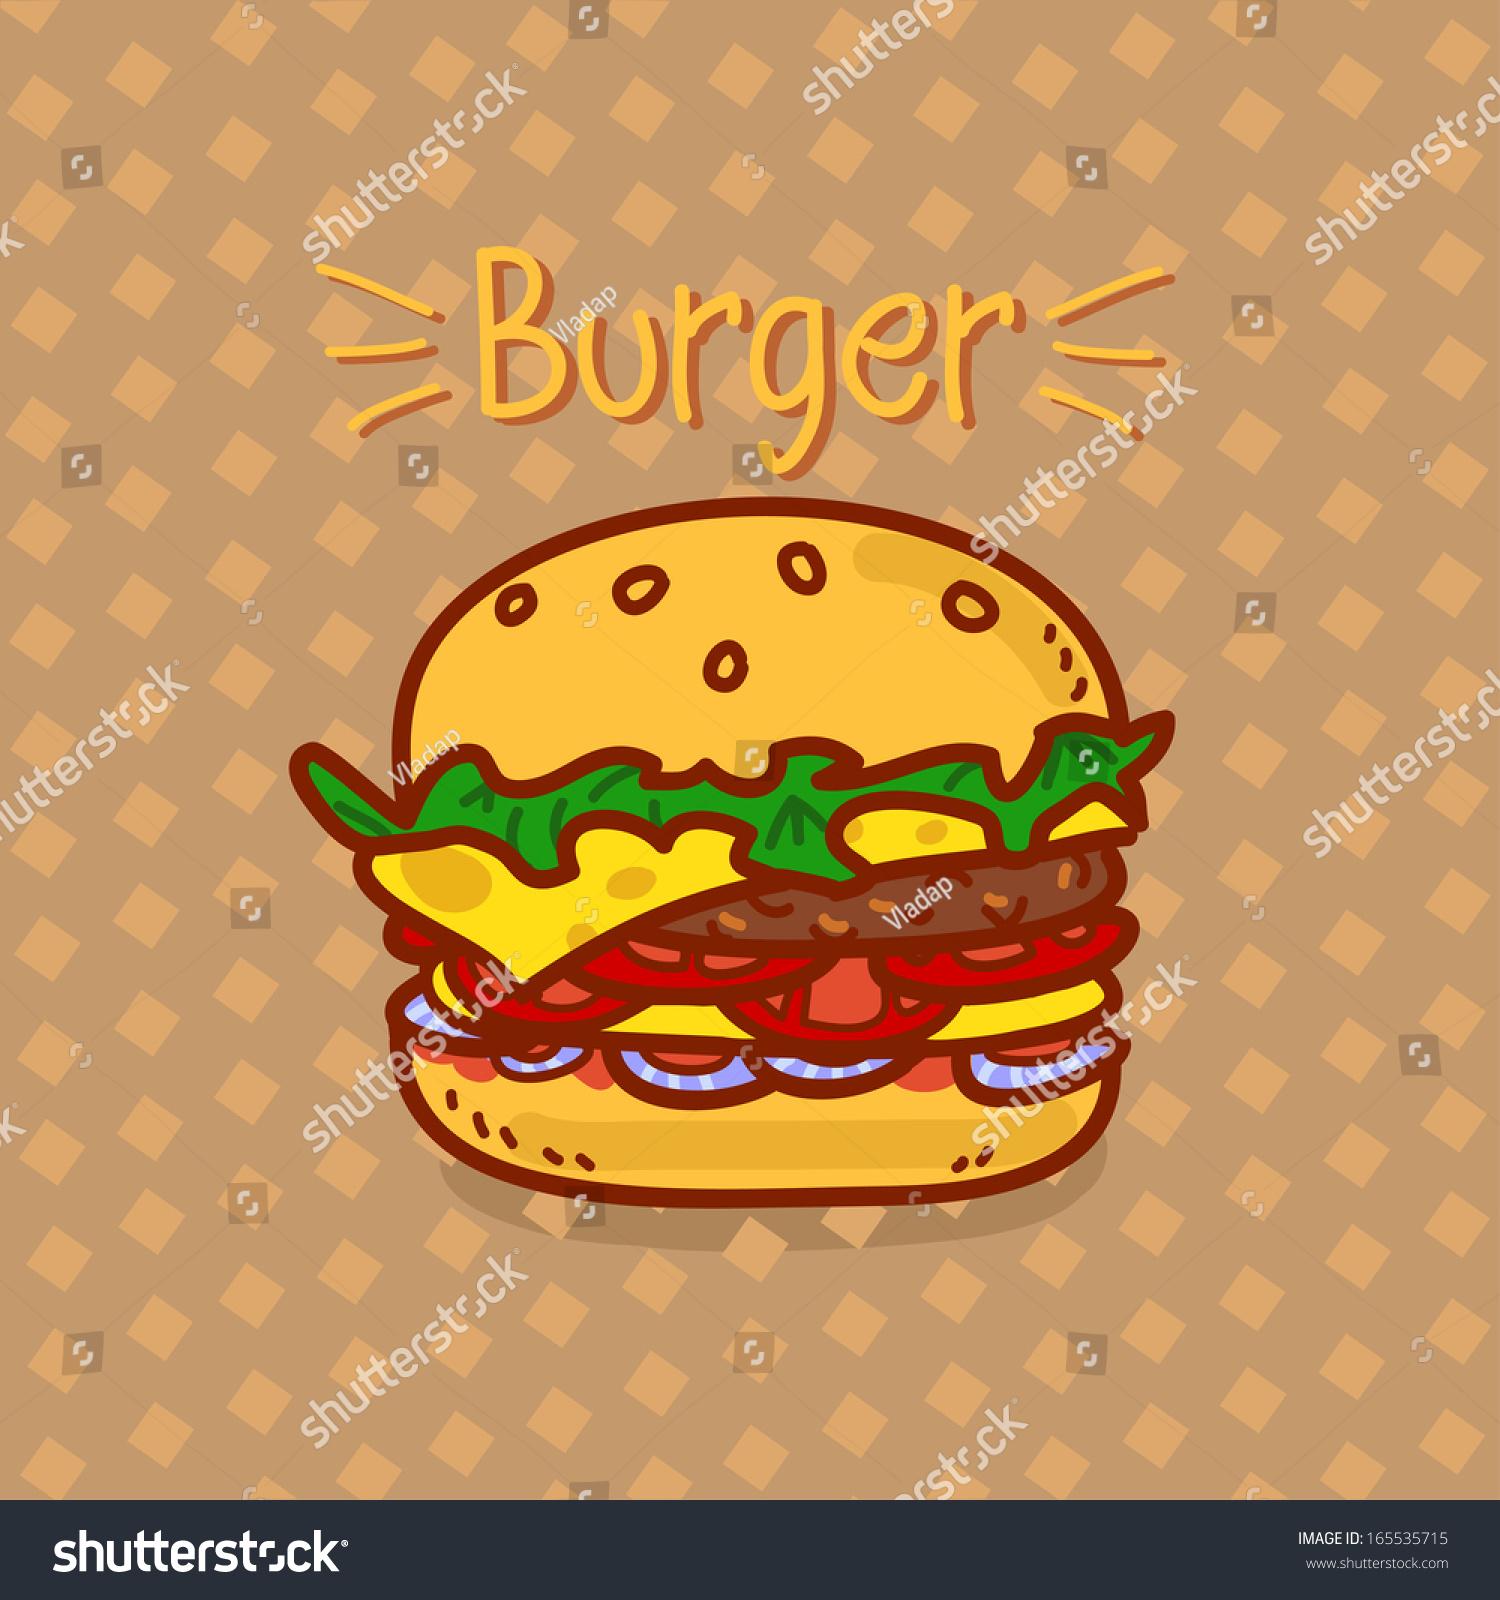 cartoon hamburger wallpaper - photo #10